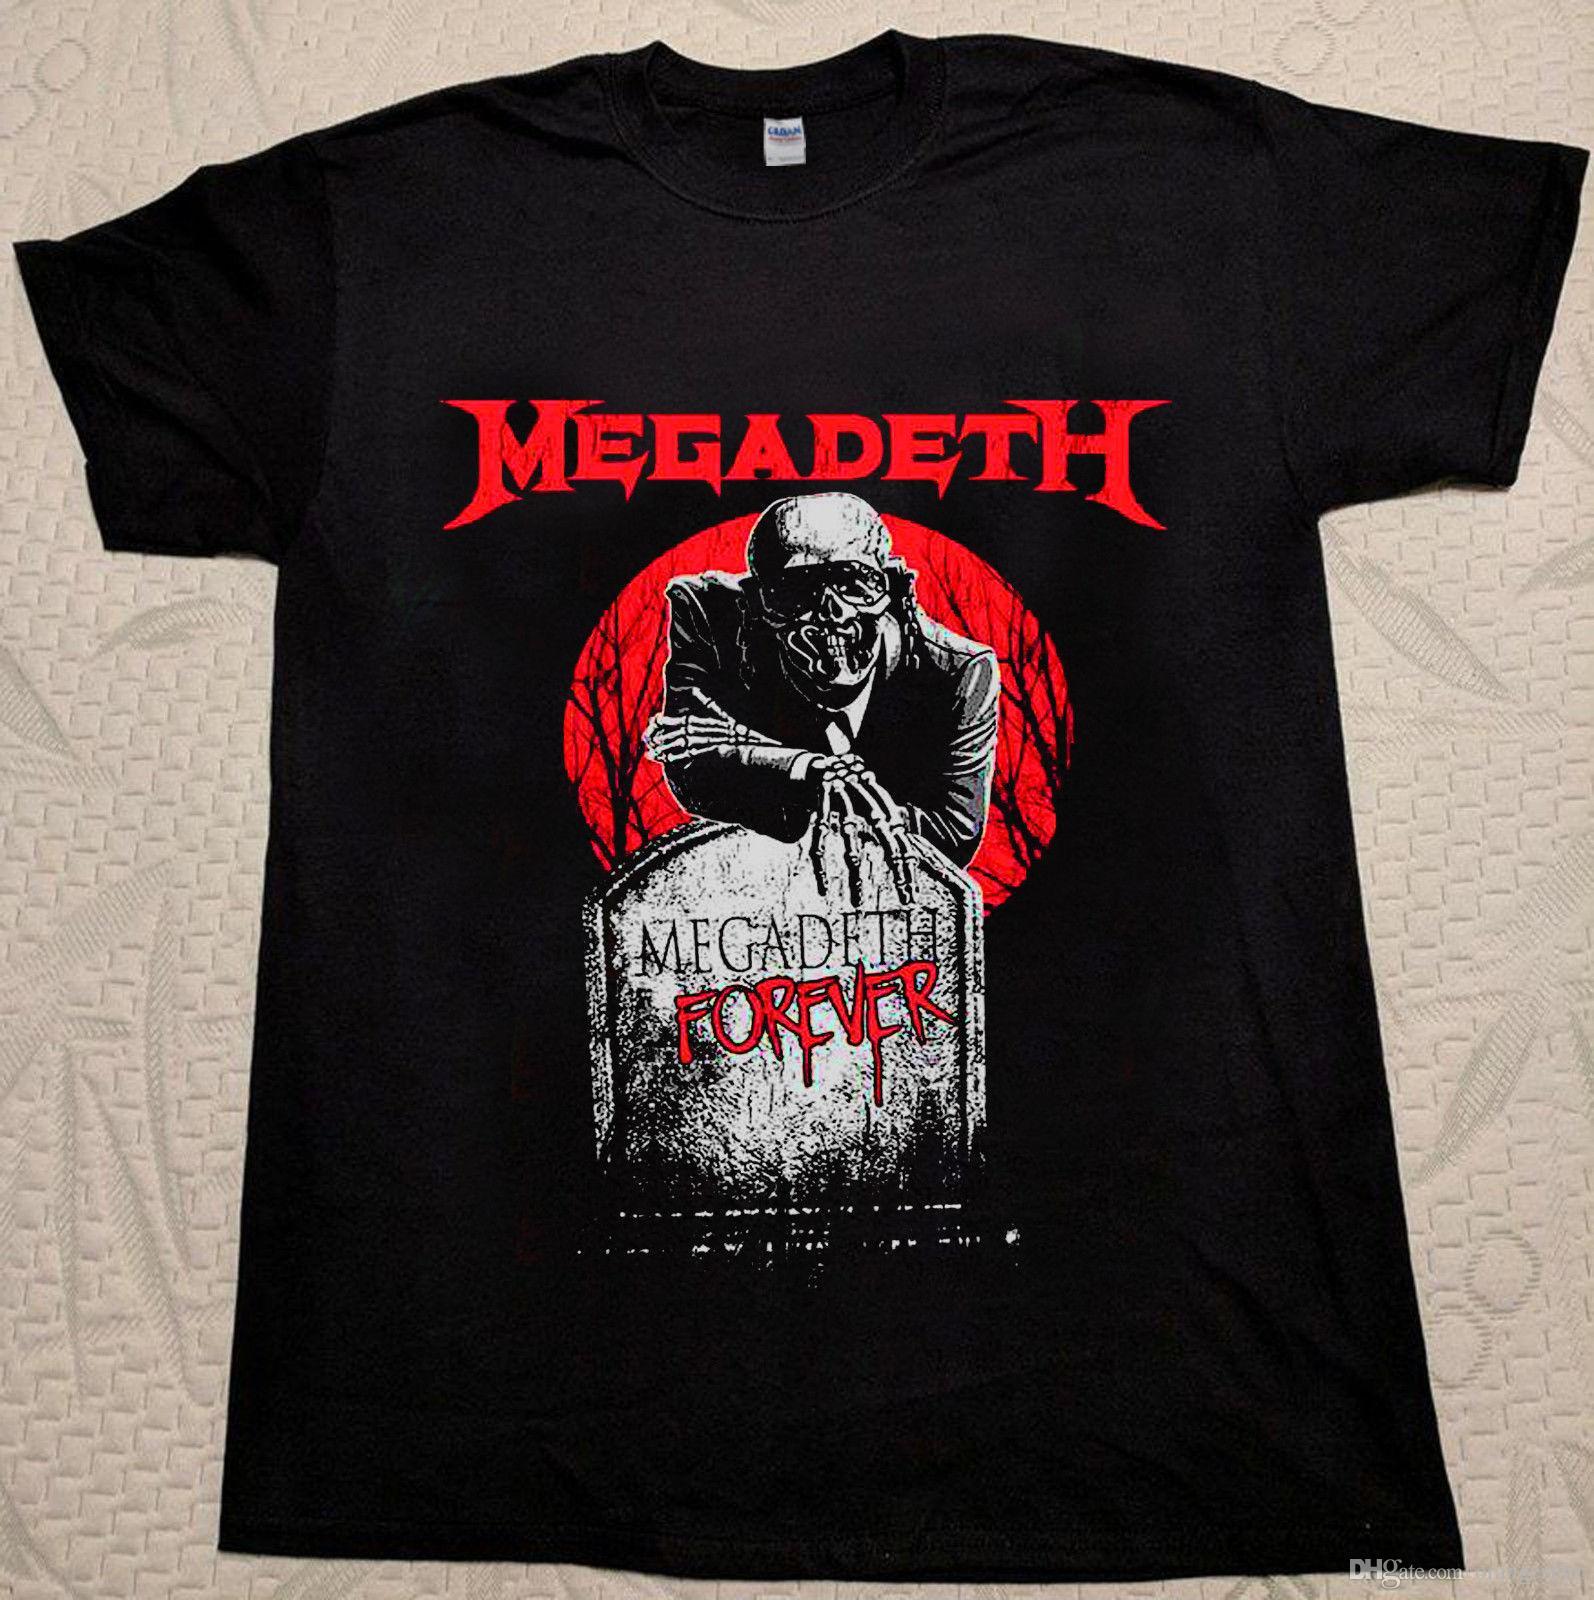 080504374e5b5 Compre Camiseta Megadeth Camiseta Rara Camiseta De Manga Corta S 3XL A   10.65 Del Shirtsclub